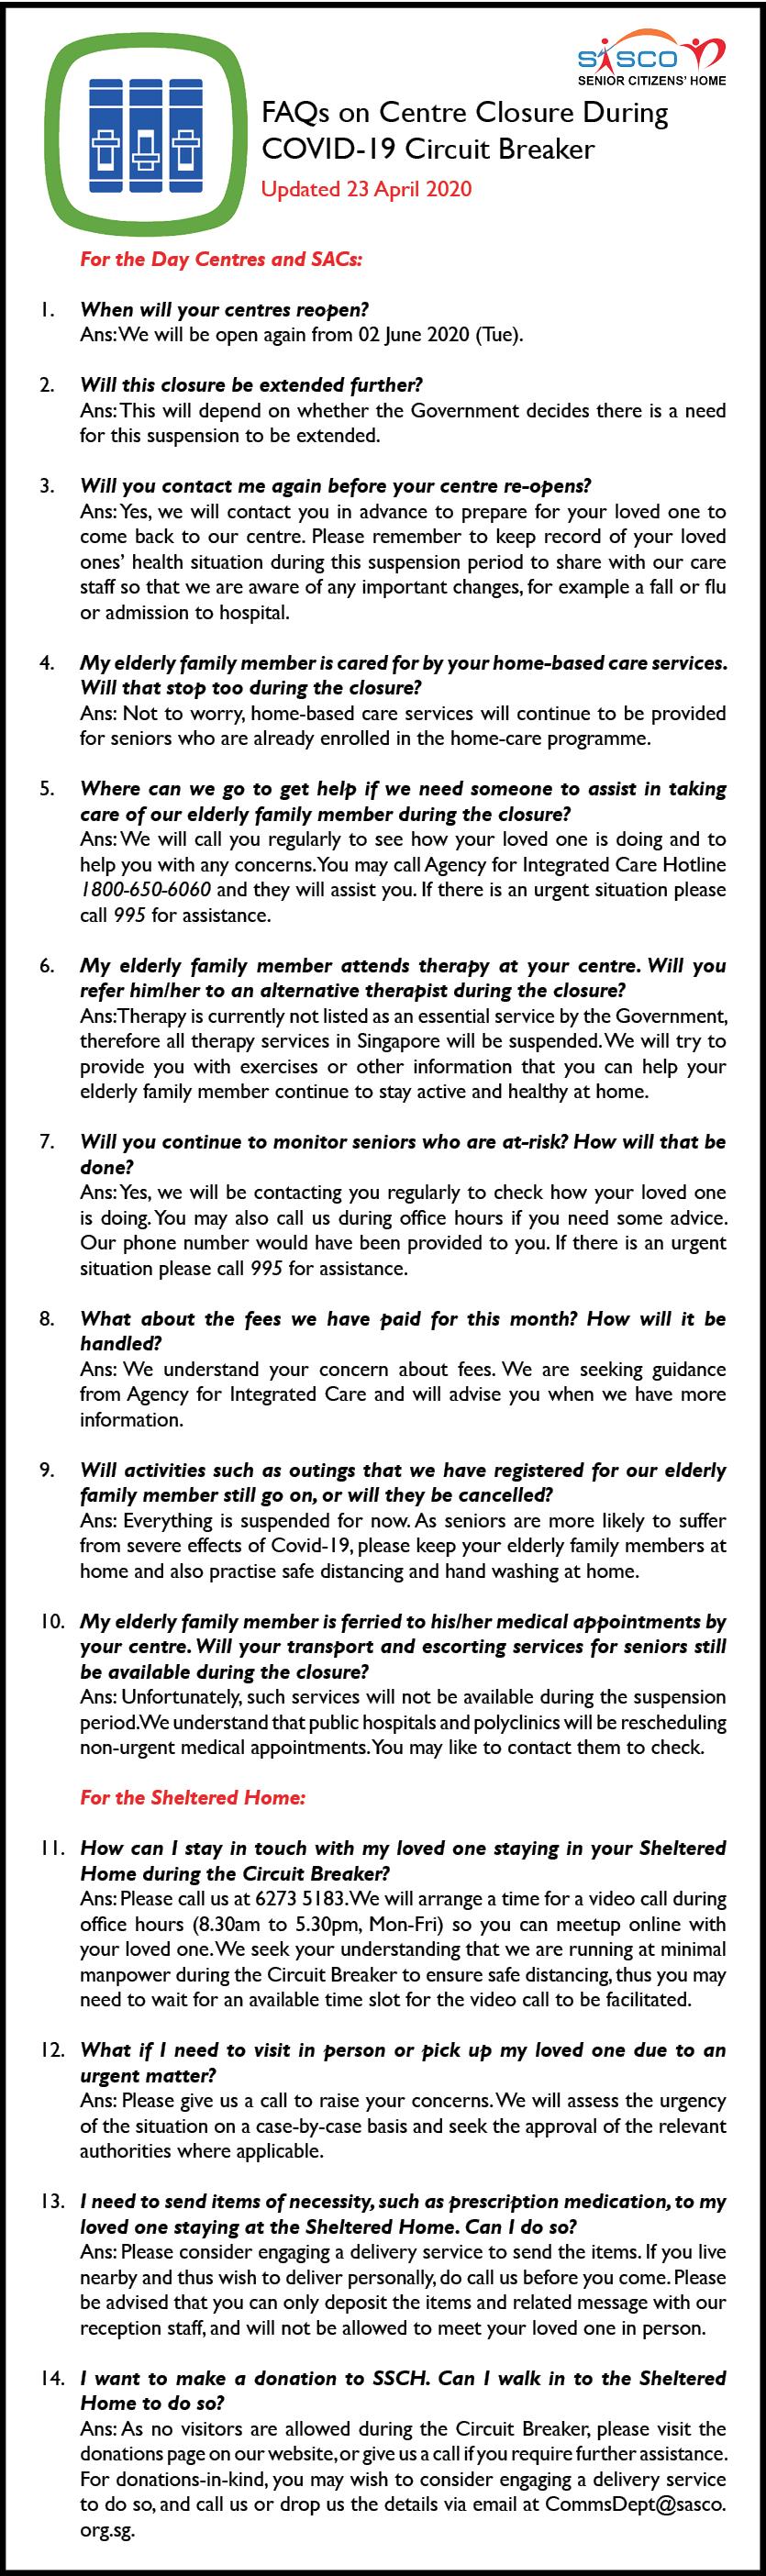 FAQs on Centre Closure v3 23 Apr 2020.pn